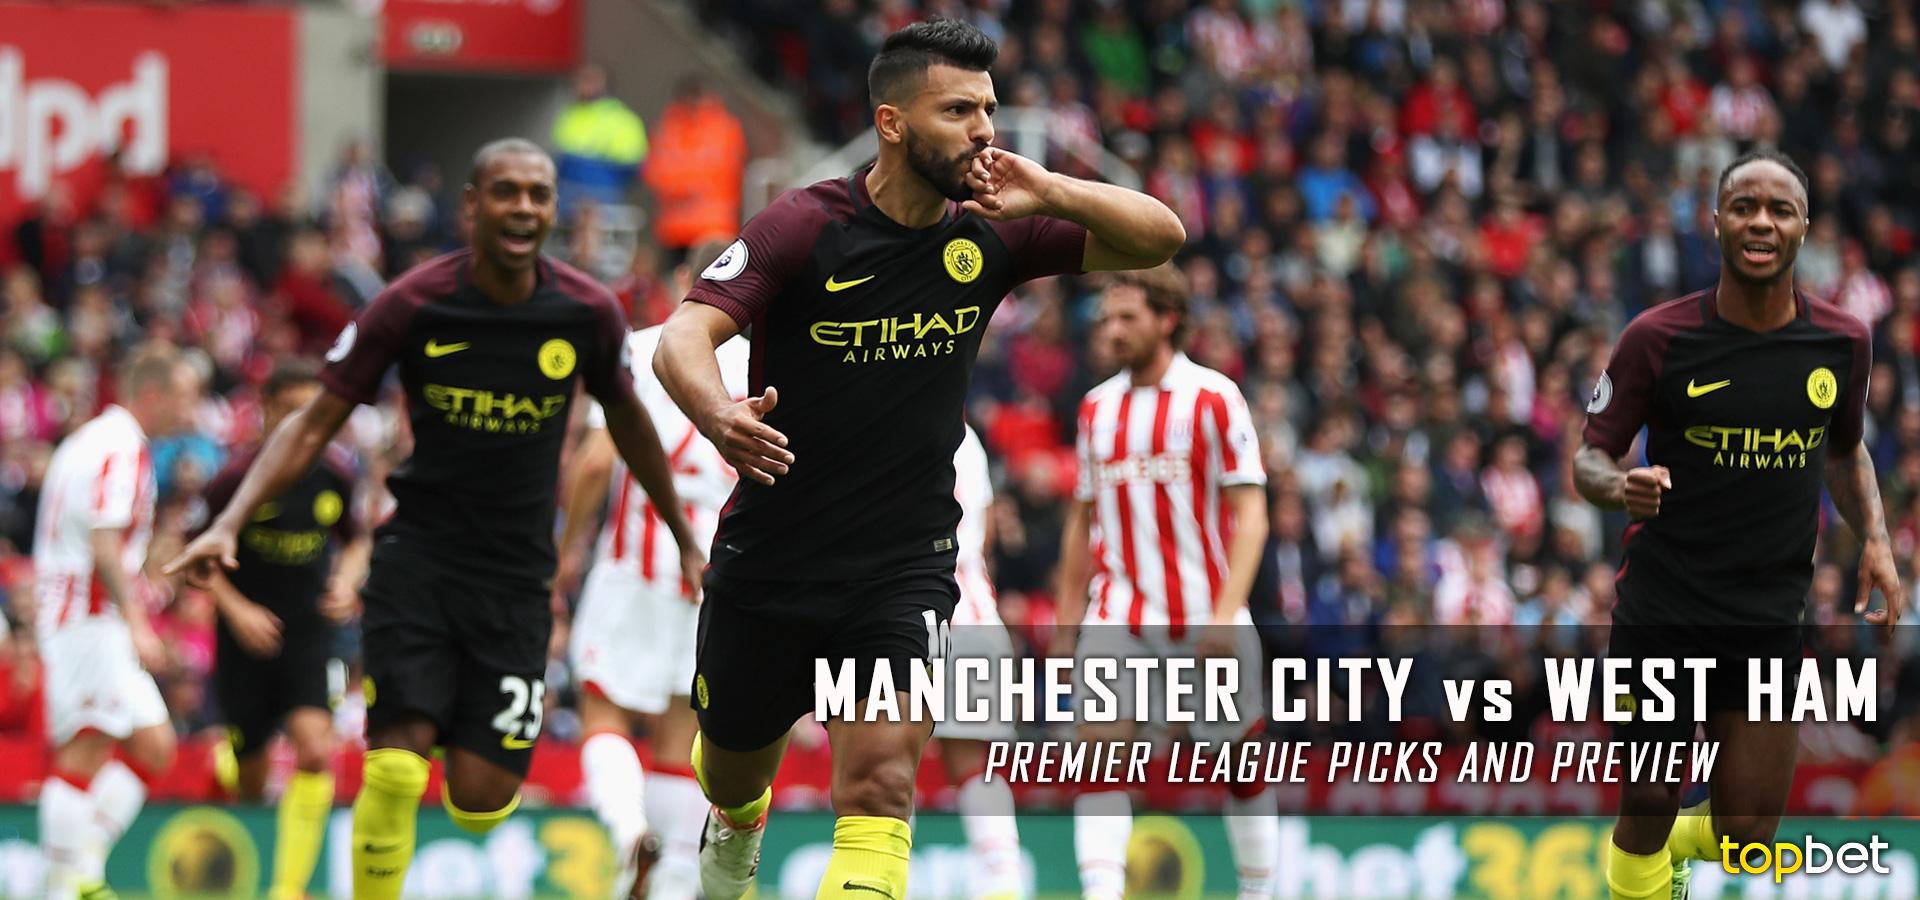 Barcelona Vs Manchester City Logo: Manchester City Vs West Ham Predictions, Picks And Preview